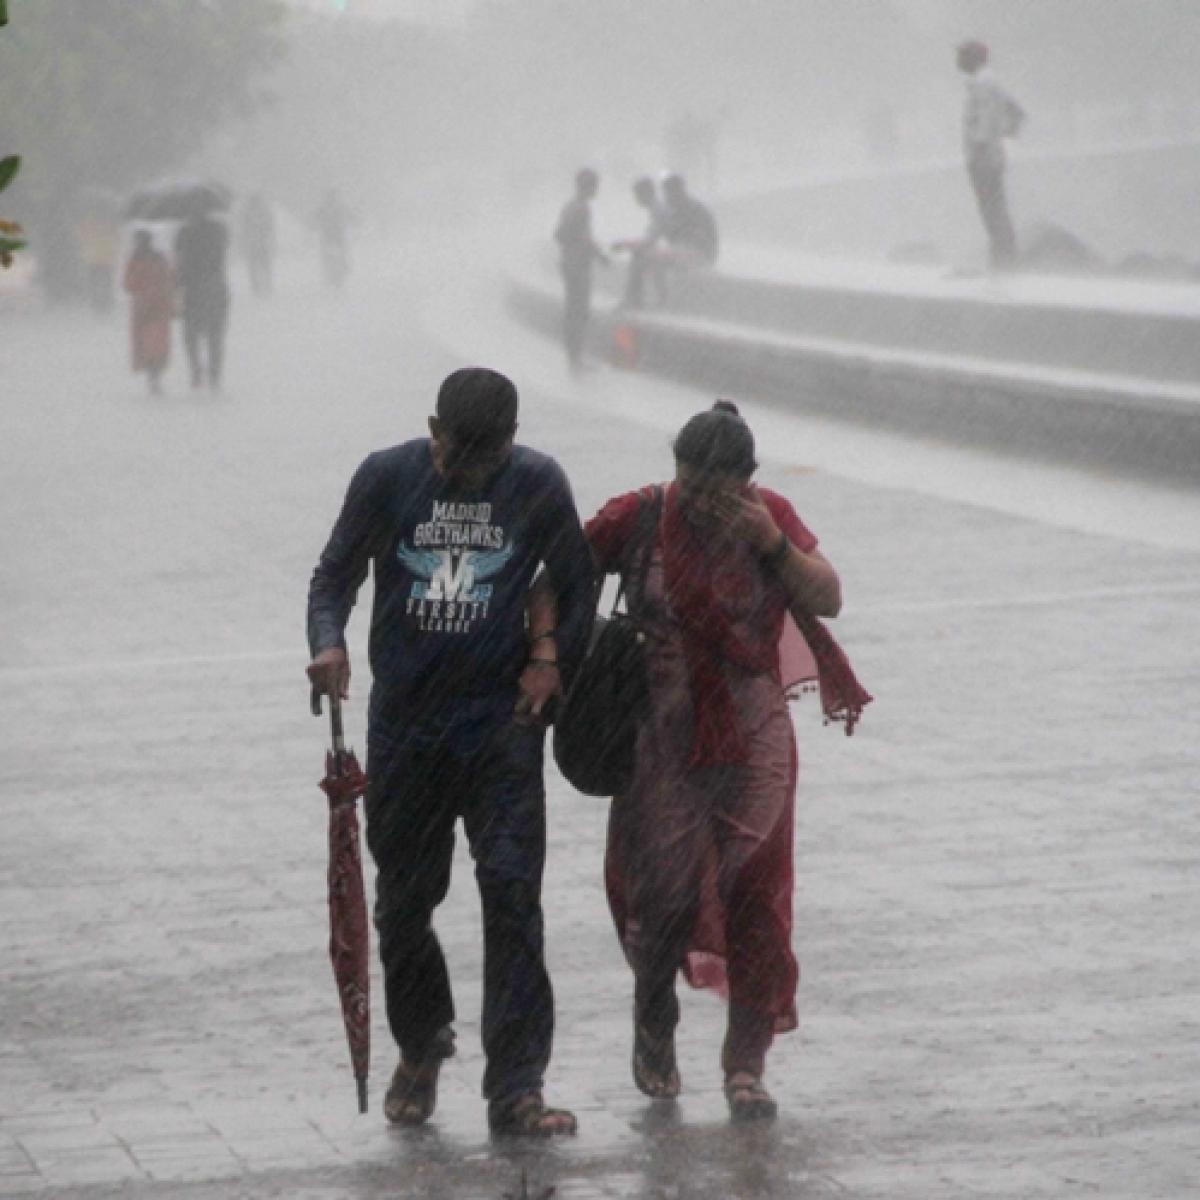 Heavy rains continue to lash Mumbai, schools ordered shut